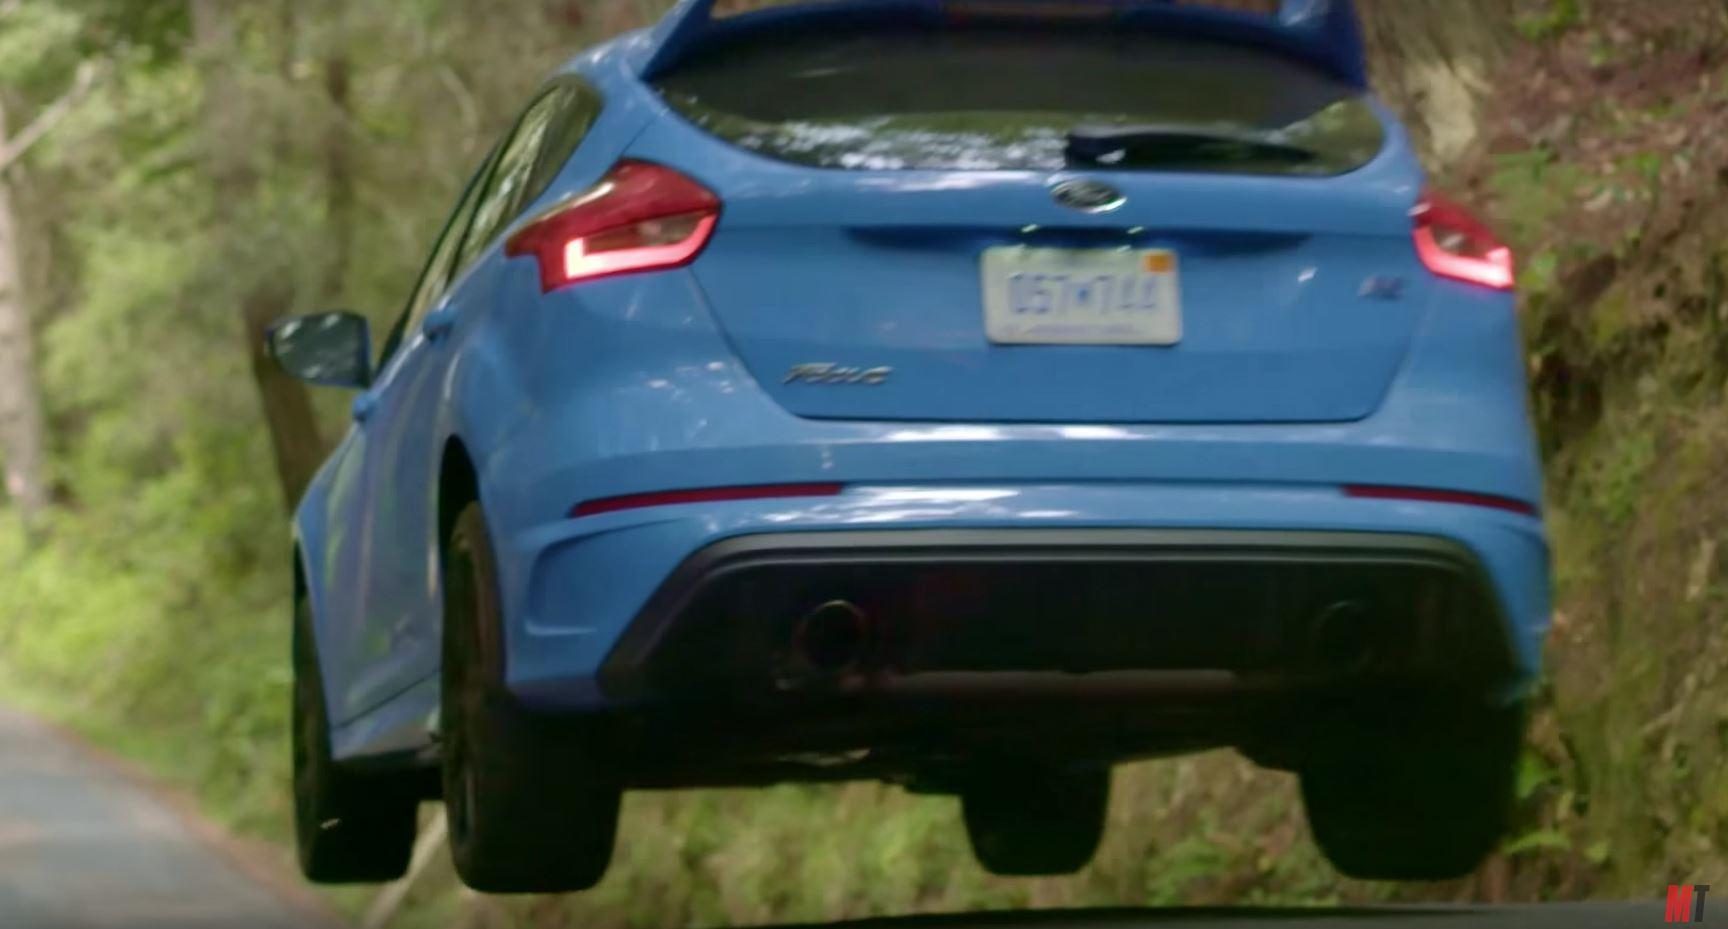 Focus Rs Vs Golf R Head 2 Huge Jumps Brakes On Fire